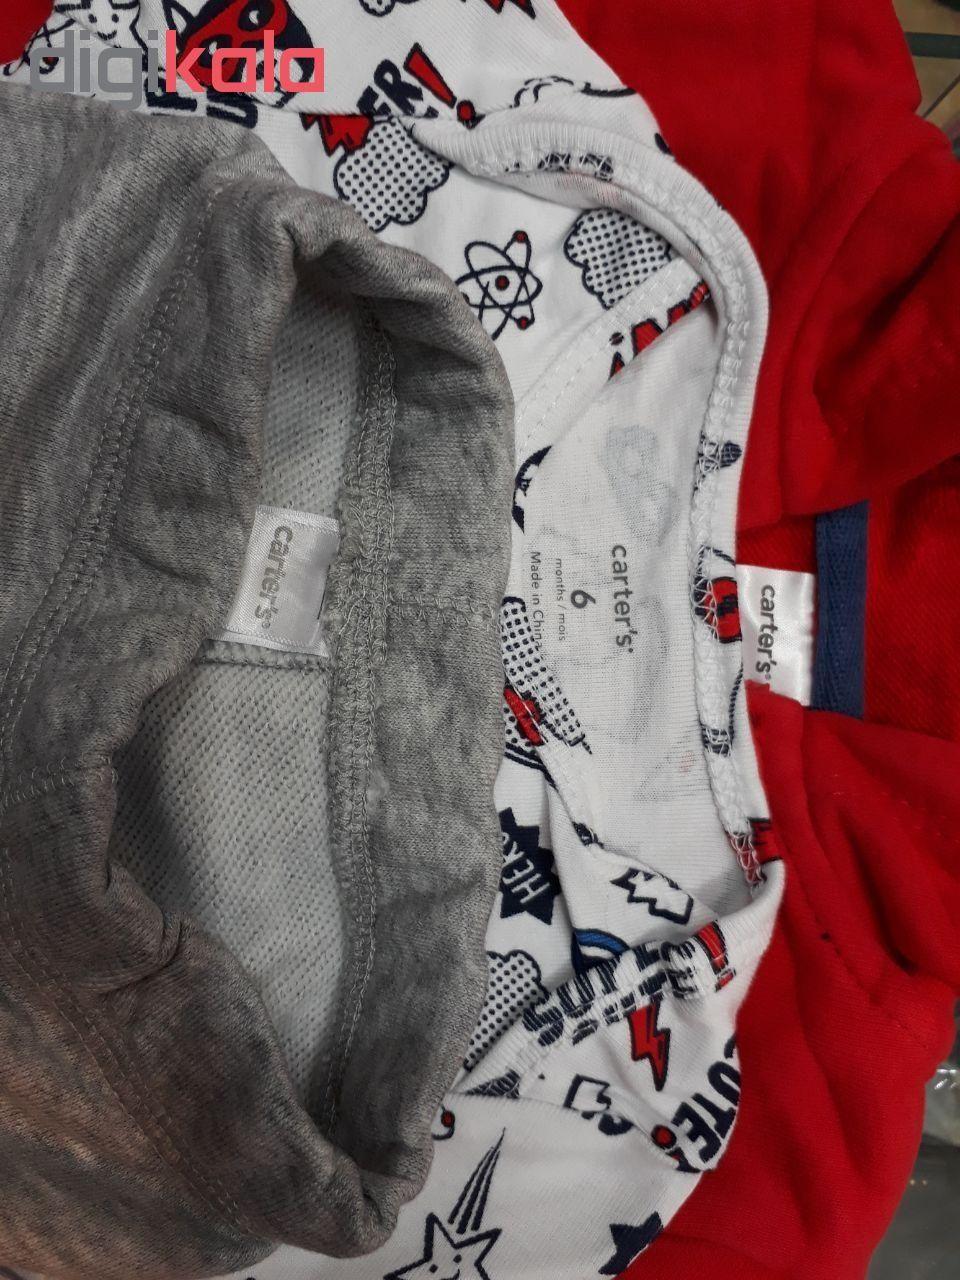 ست 3 تکه لباس نوزادی پسرانه کارترز کد 1022 -  - 4